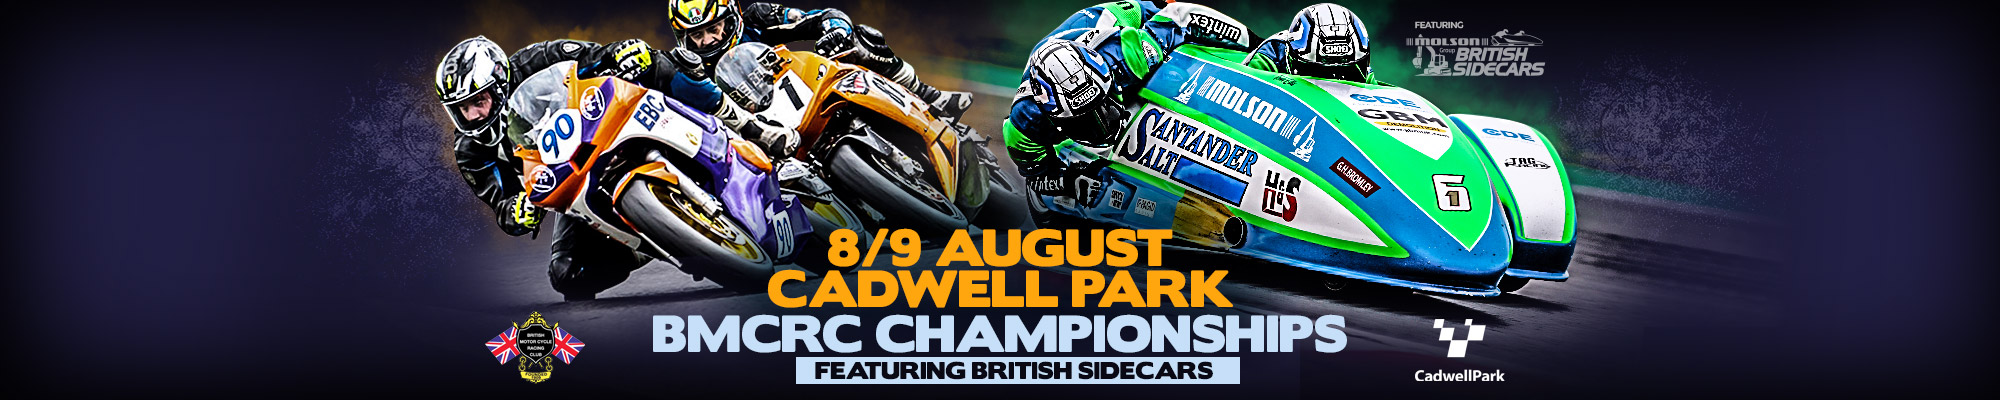 BMCRC Championships featuring British Sidecars